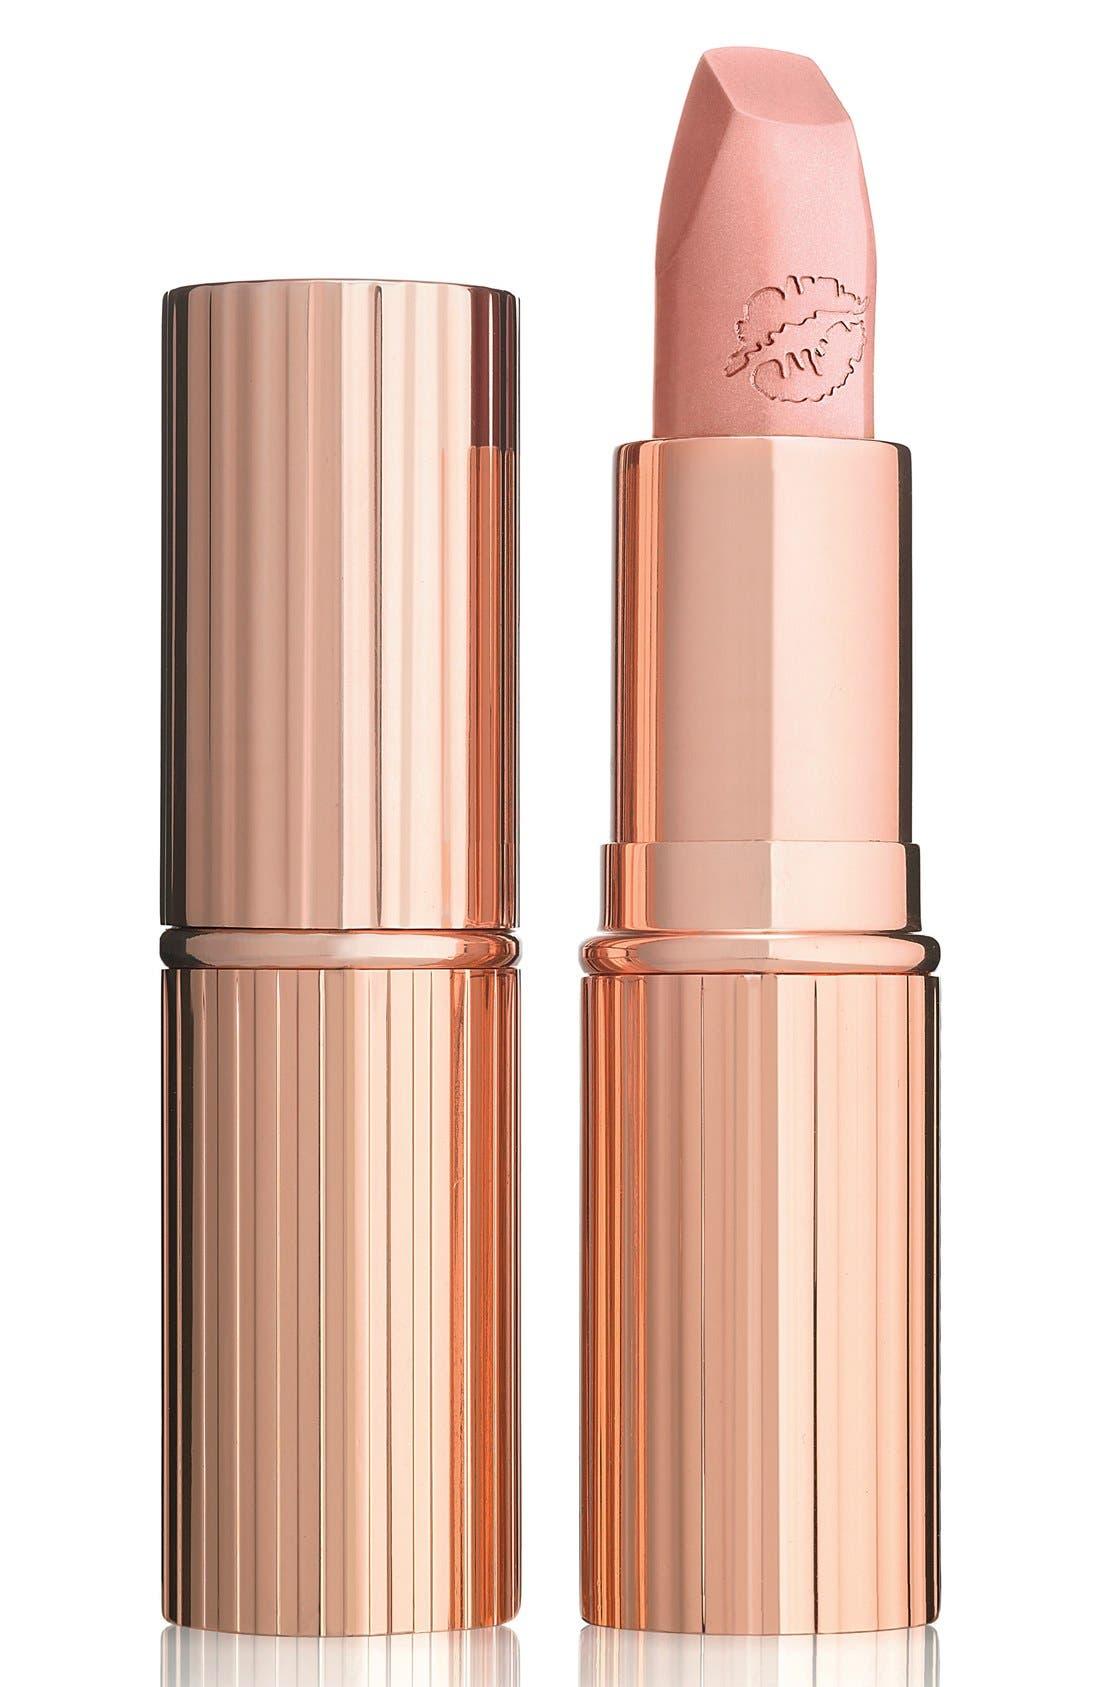 Charlotte Tilbury 'Hot Lips' Lipstick